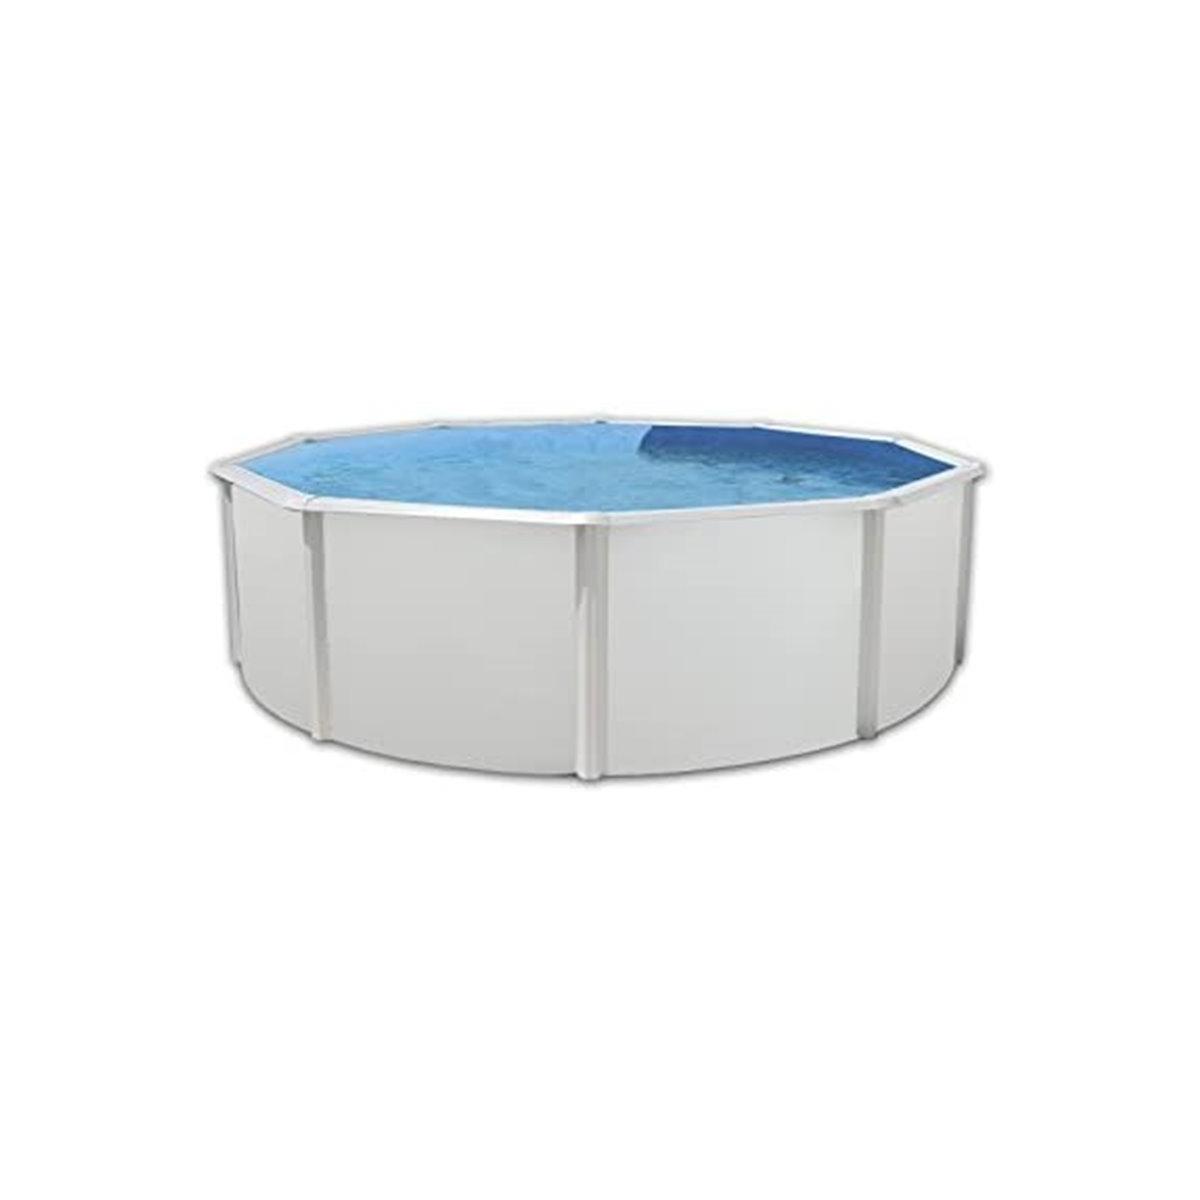 Piscina Desmontable Toi Circular 350X90 PTC402